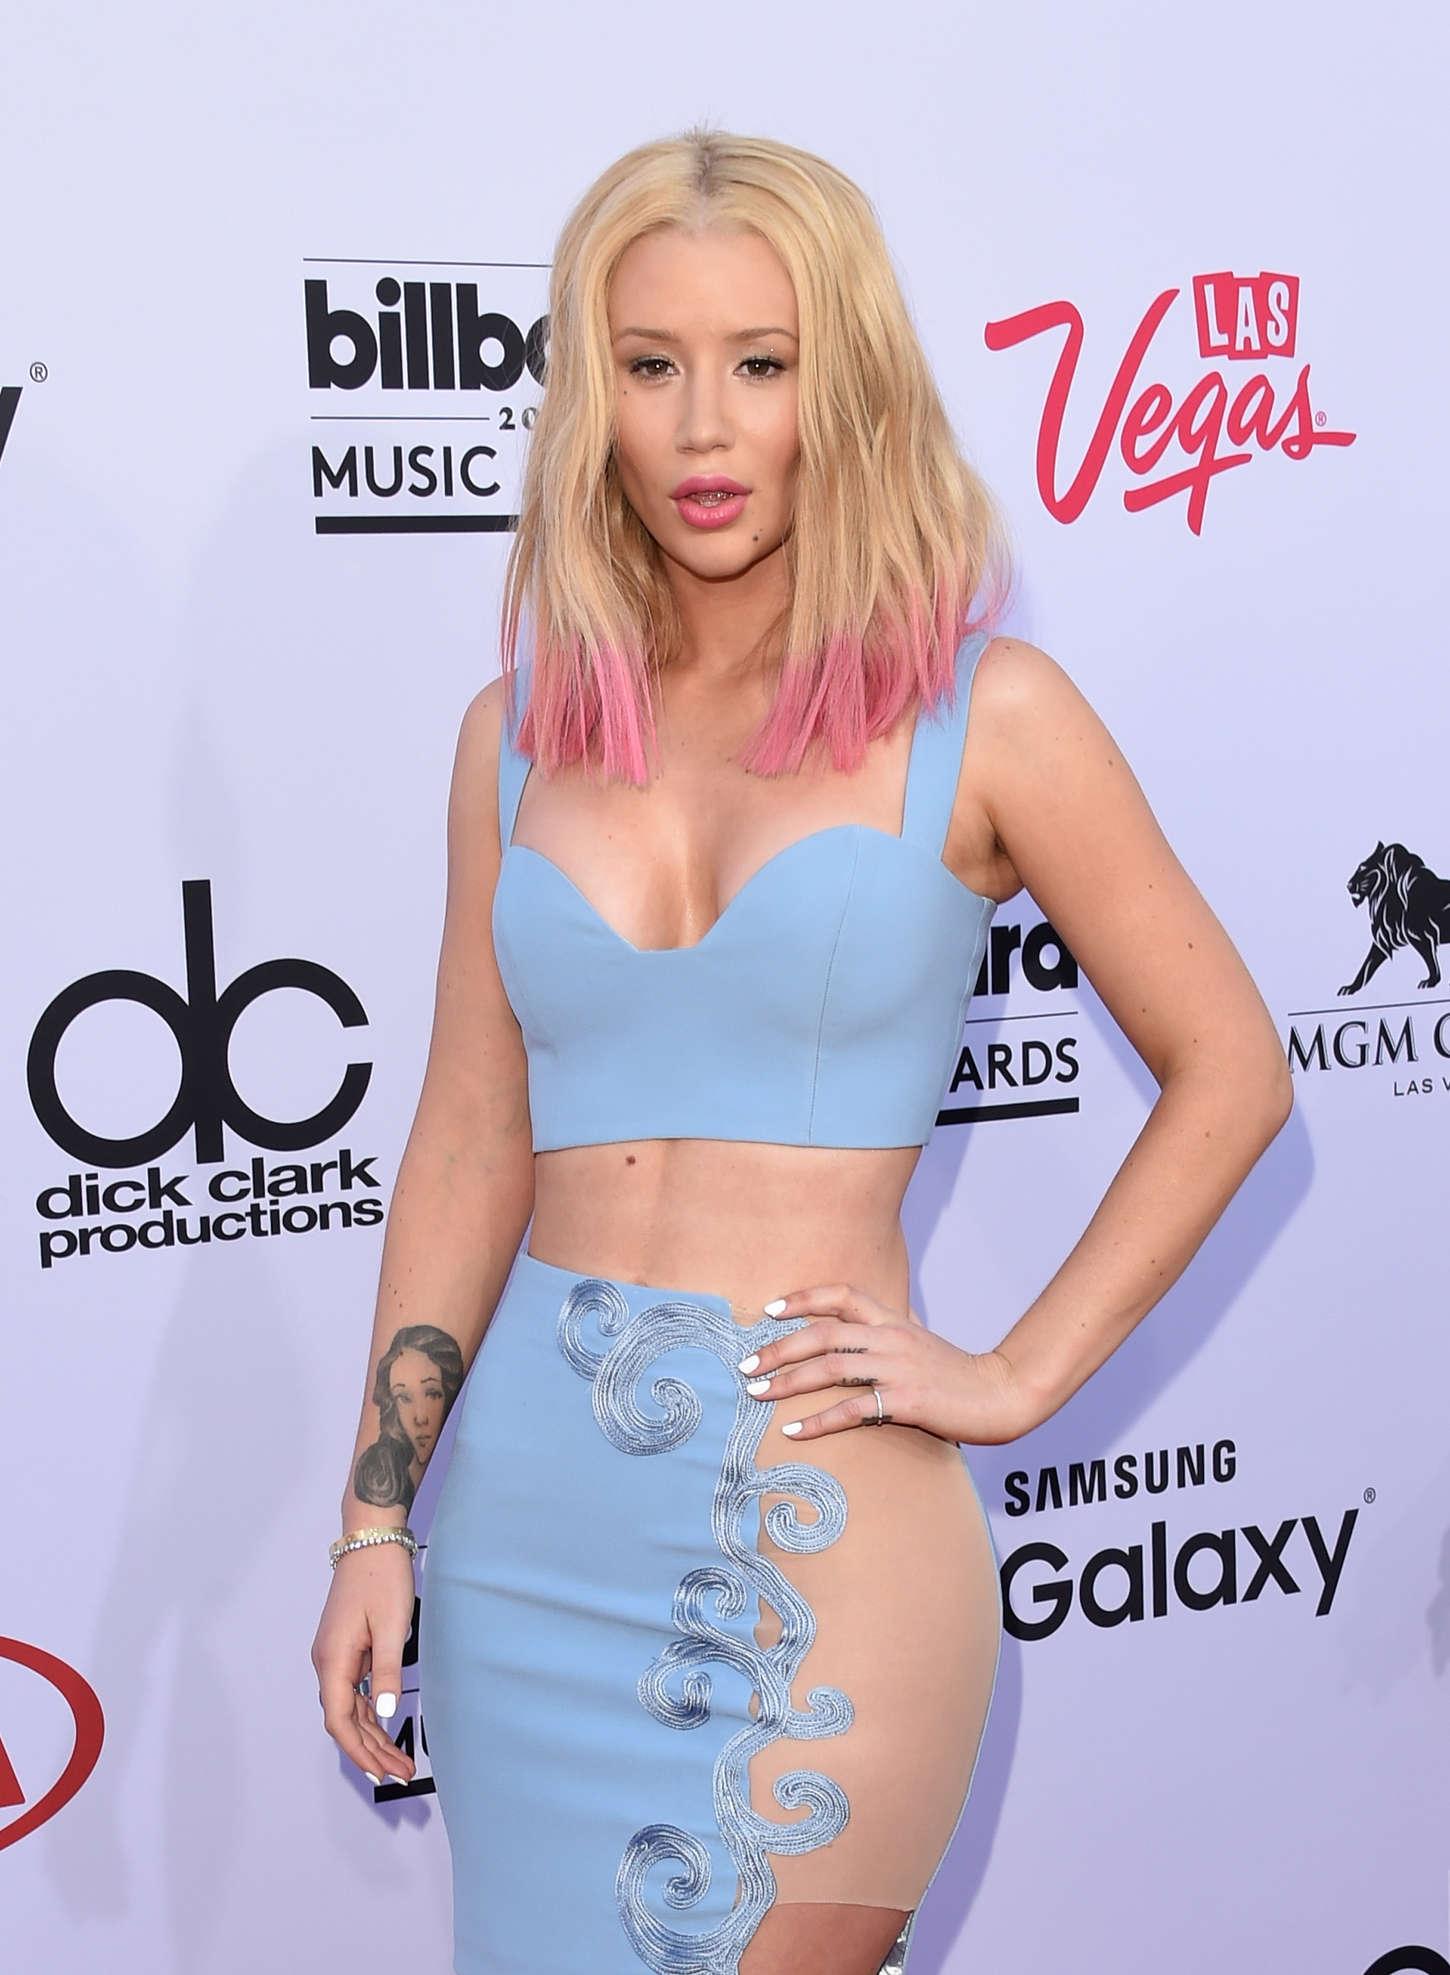 Iggy-Azalea:-Billboard-Music-Awards-2015